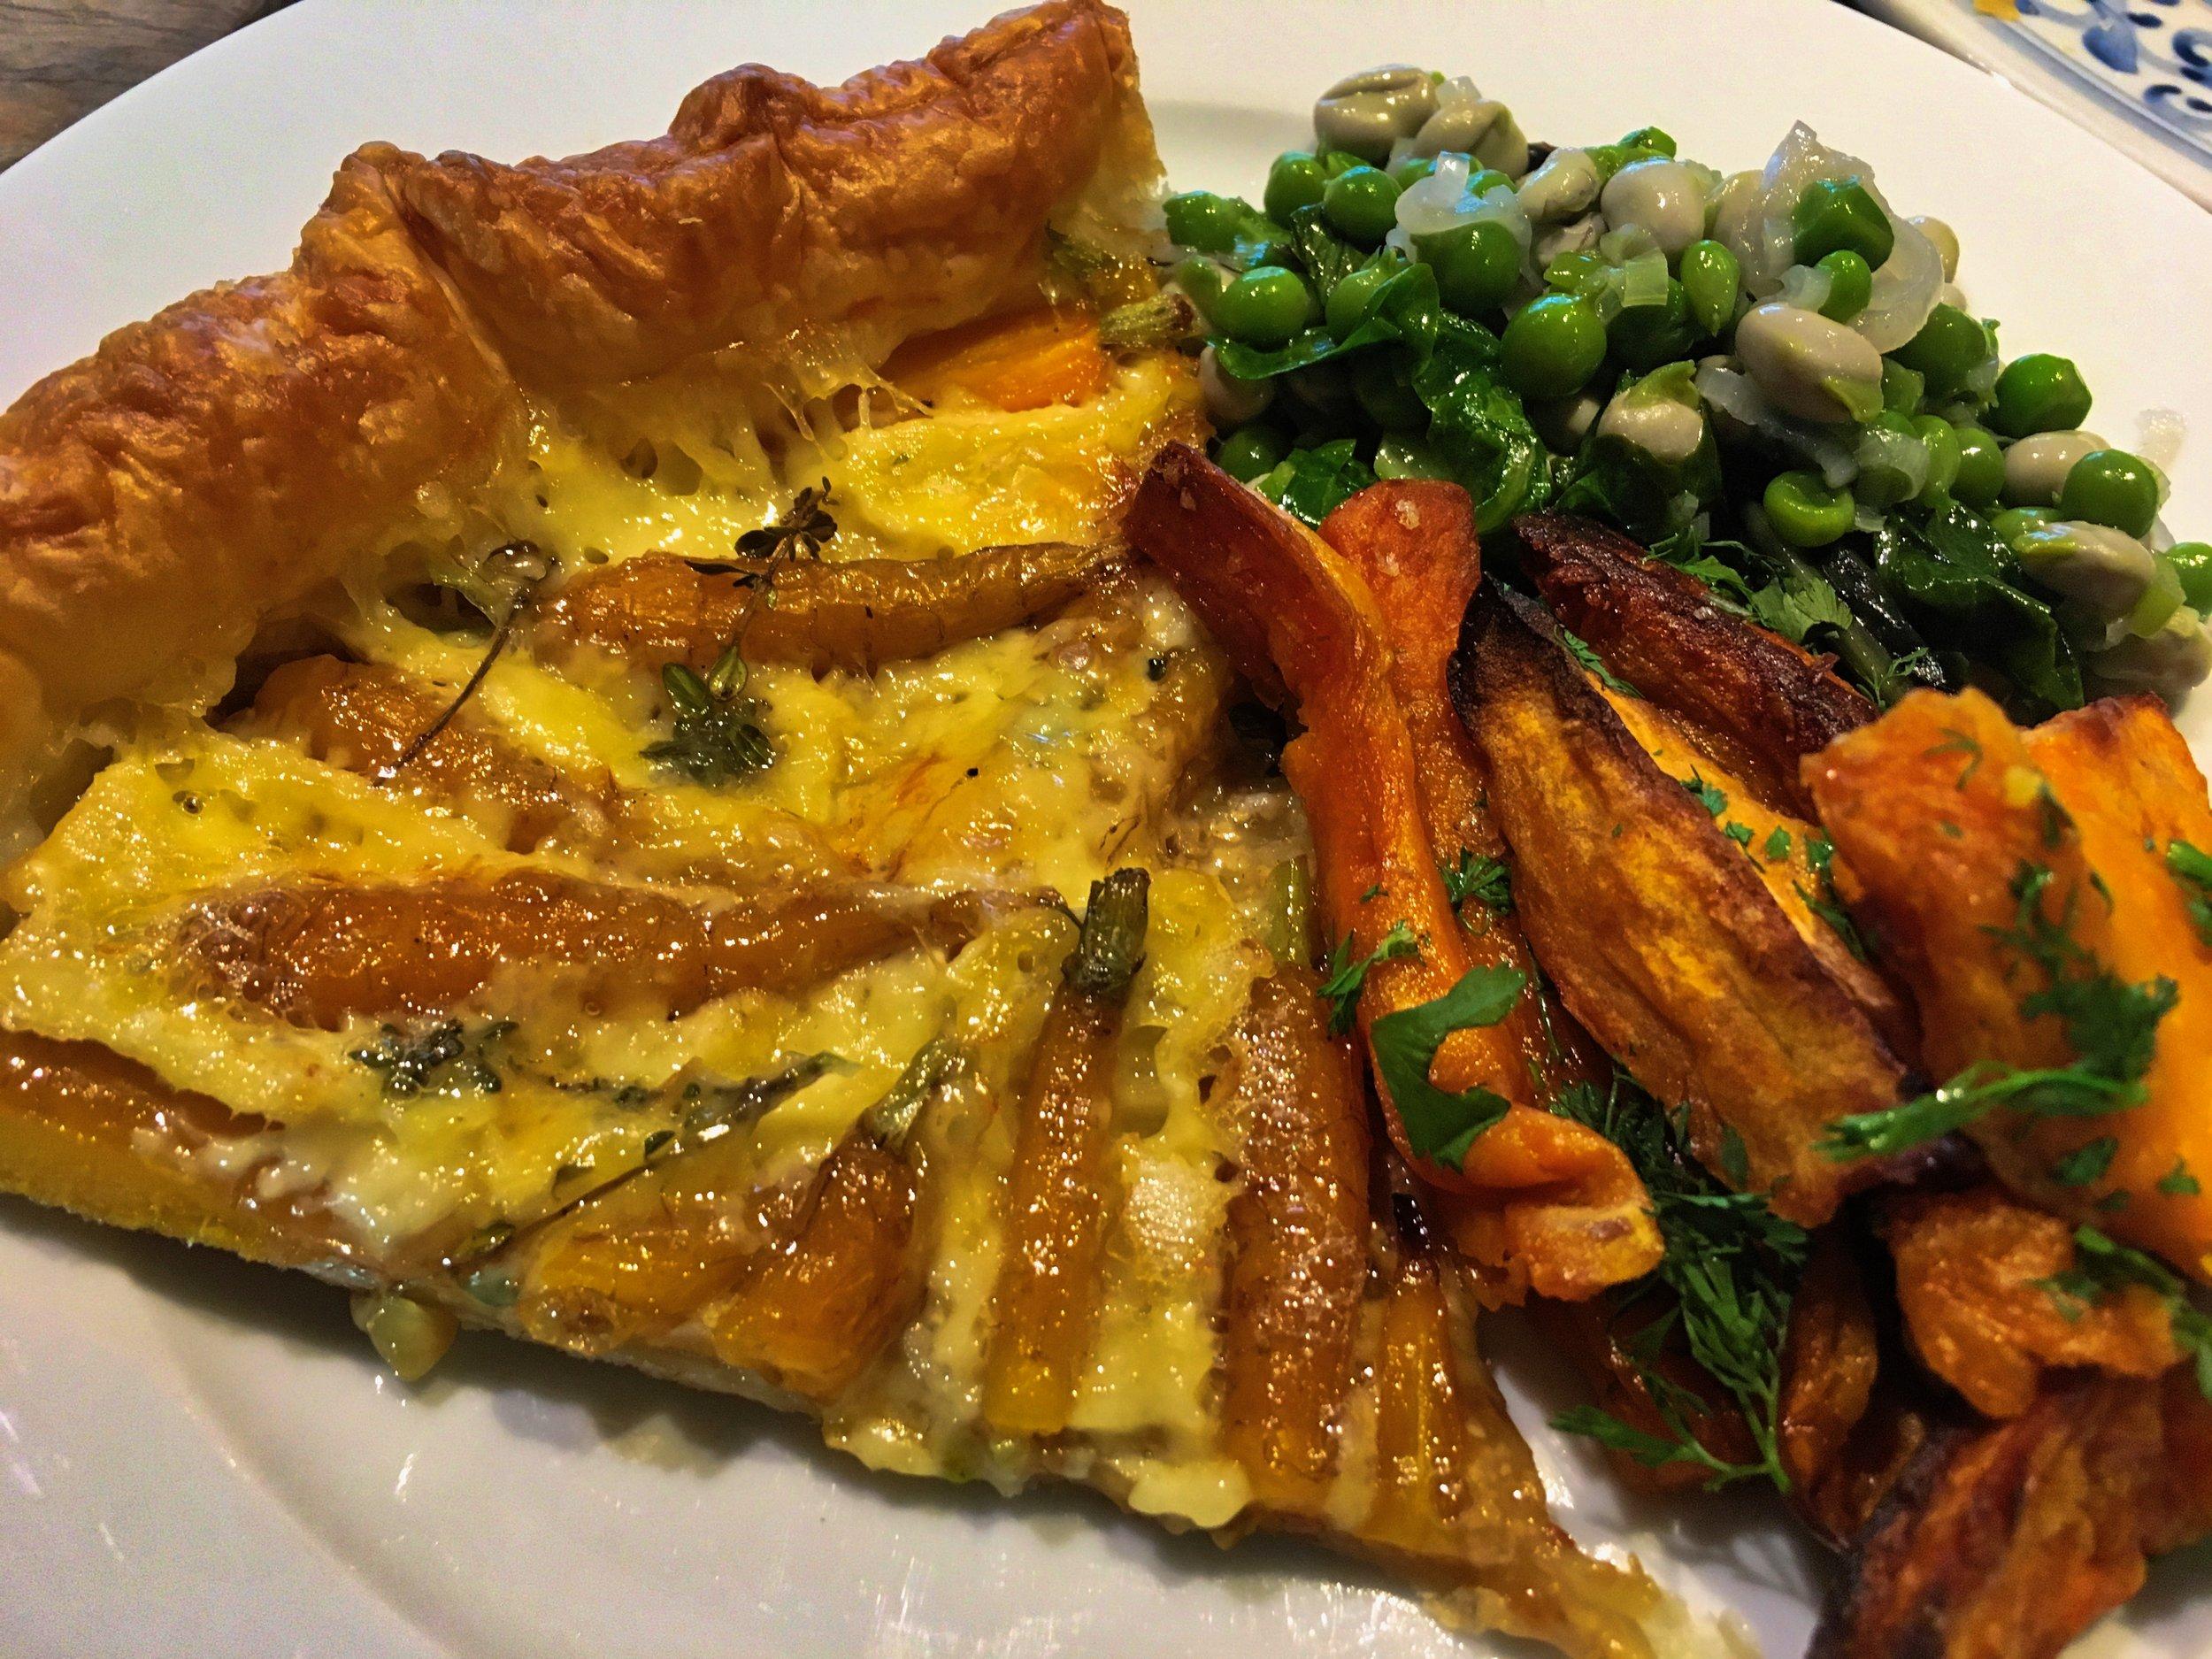 Carrot & Camembert tart with luscious peas & roasted sweet potatoes